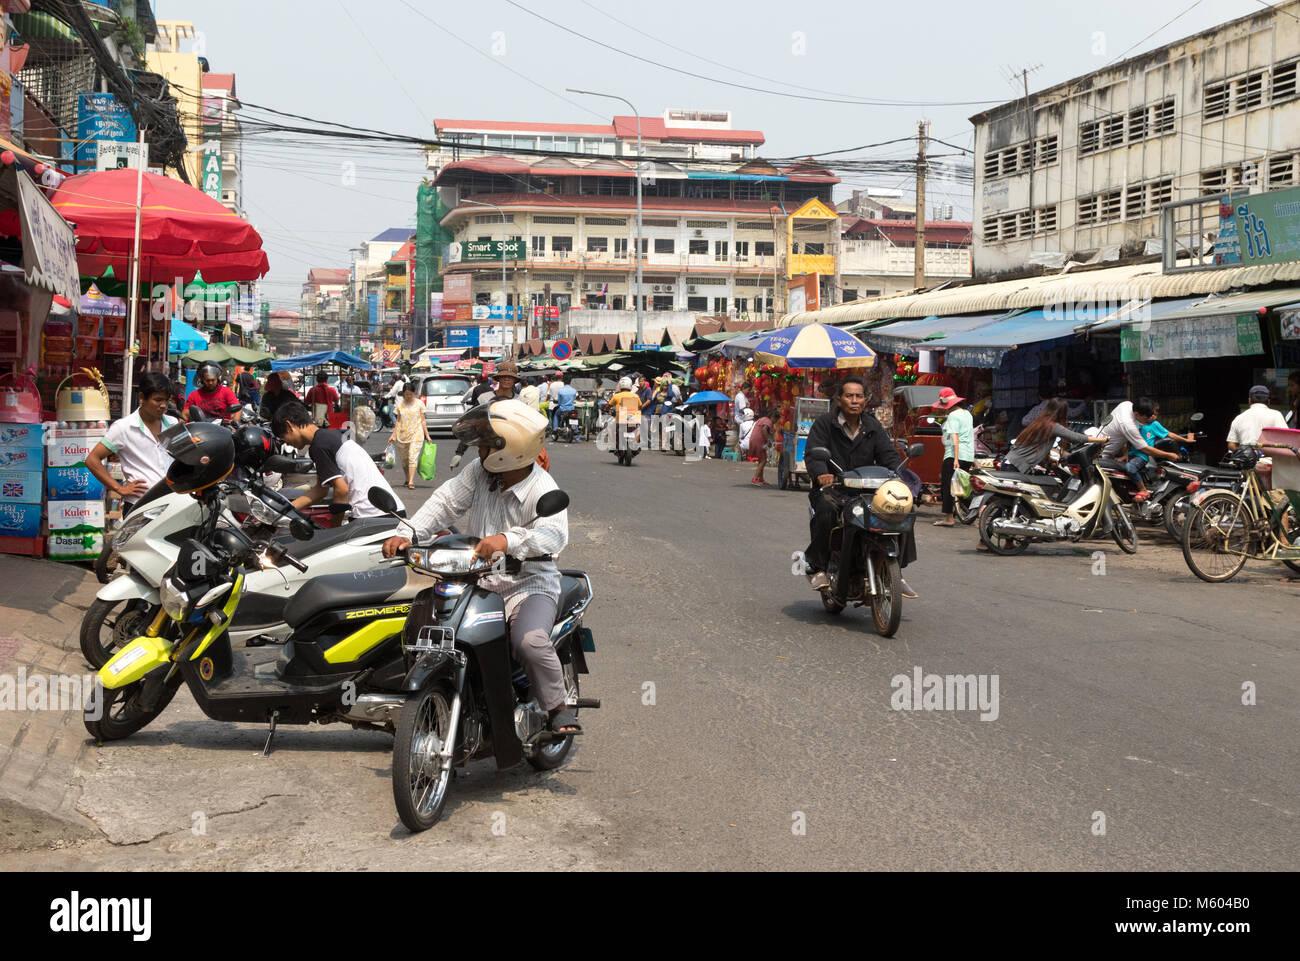 Cambodia Phnom Penh - Busy street view, with motorcycles, Phnom Penh, Cambodia Asia - Stock Image